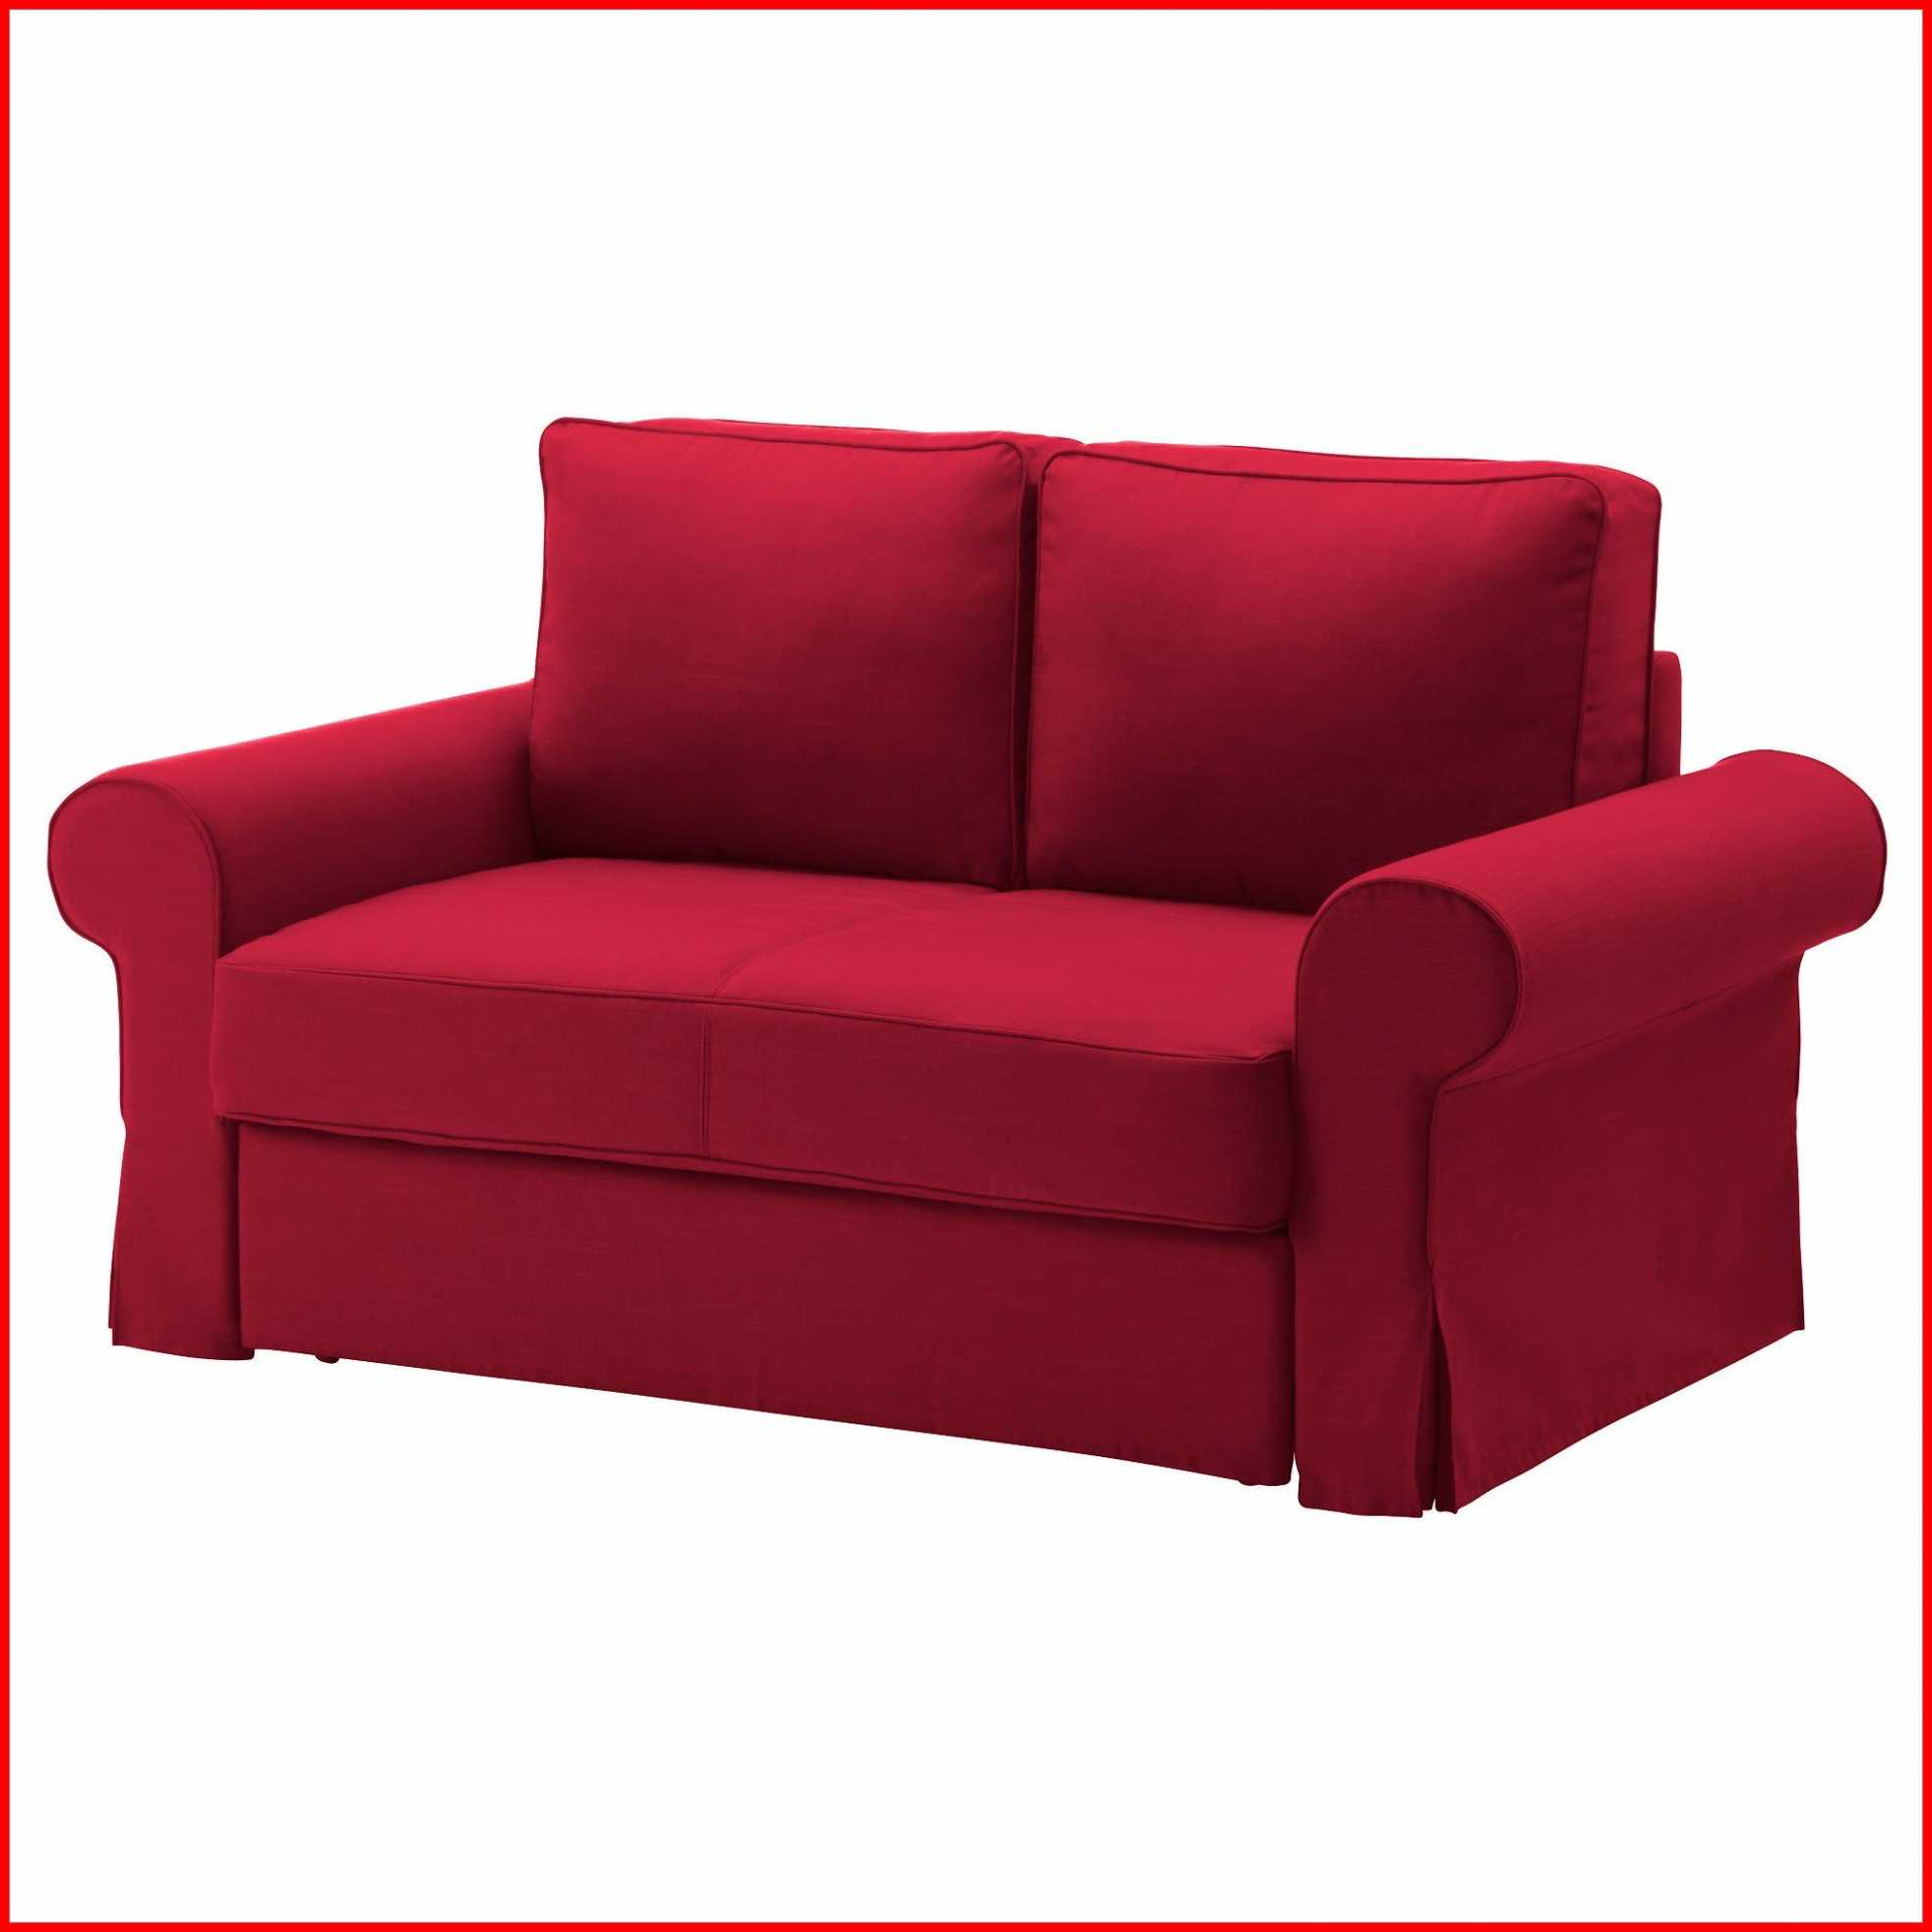 Sofas Ikea Baratos Gdd0 Ikea sofa Cama 10 Plazas sofas Cama Baratos Ikea Ikea sofa